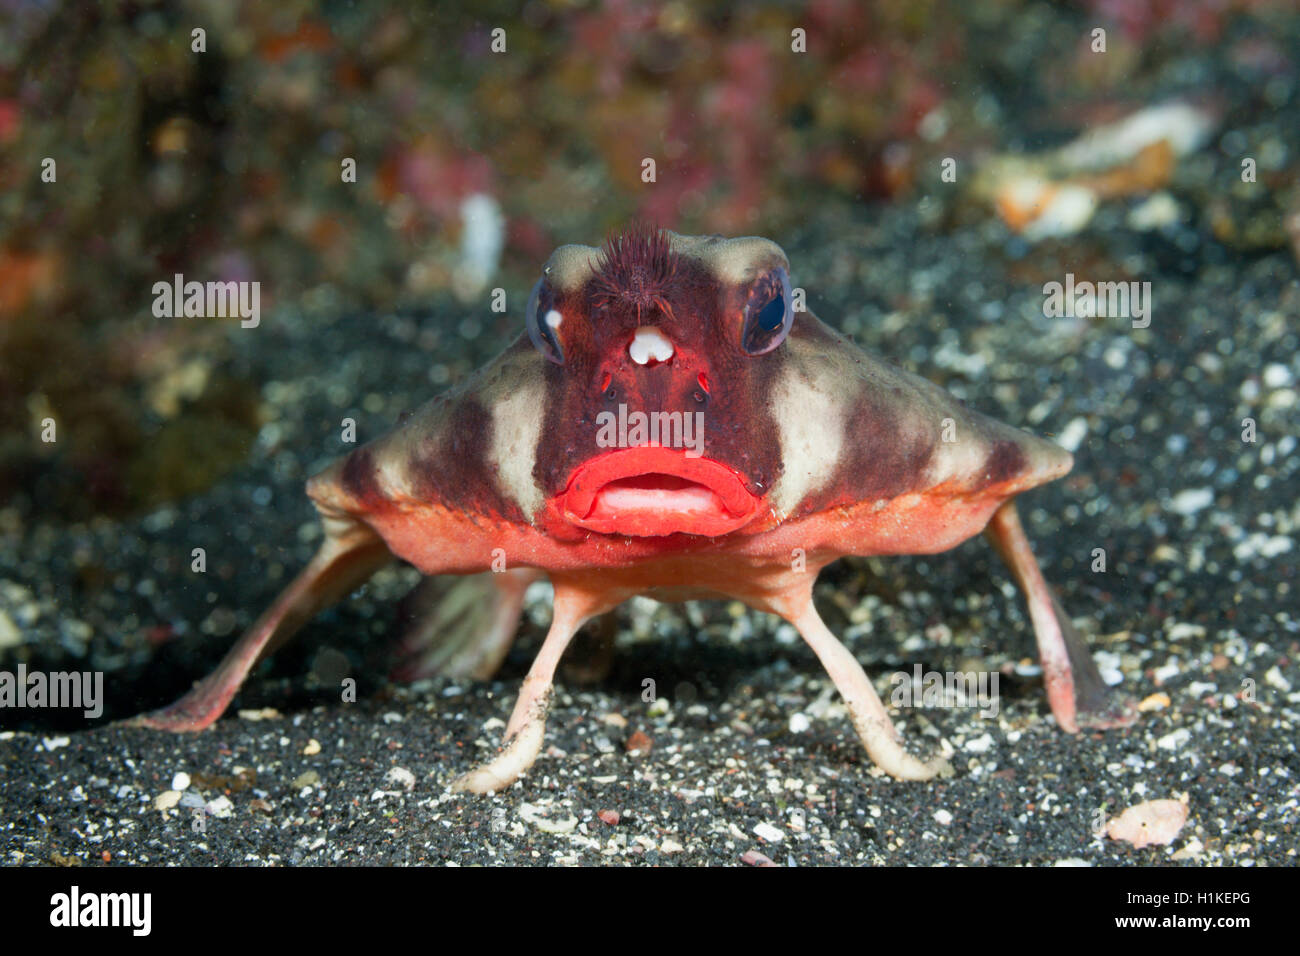 Fish Lips Stock Photos & Fish Lips Stock Images - Alamy